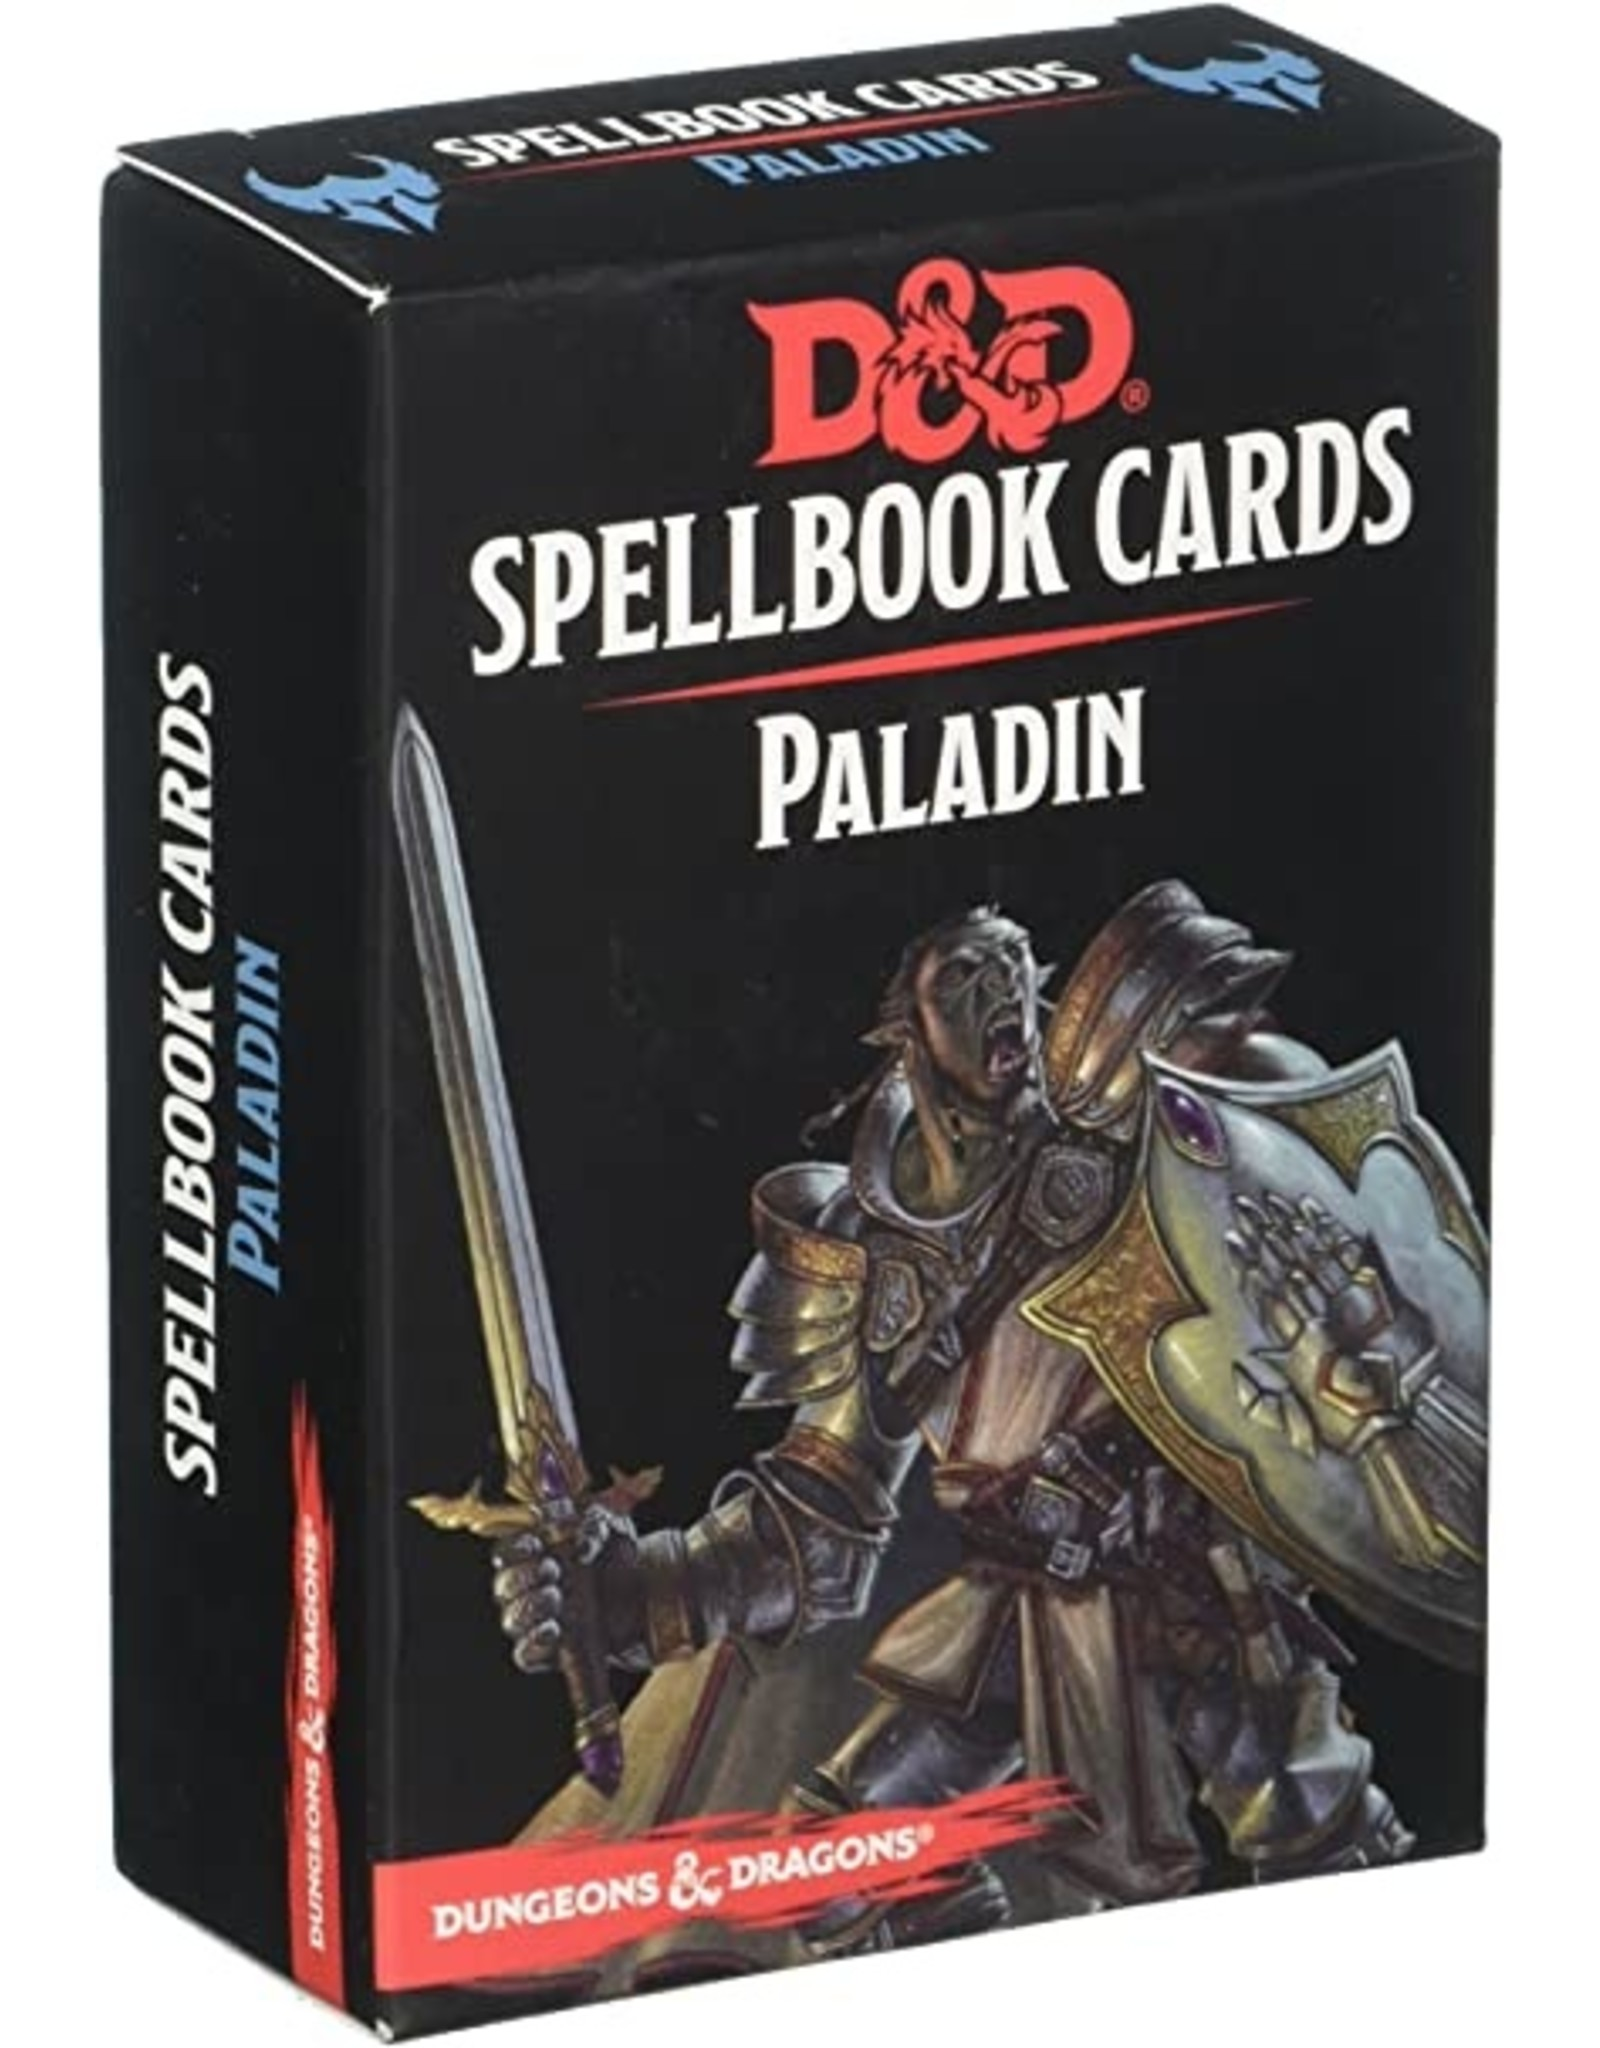 Dungeons & Dragons D&D Spellbook Cards Paladin Deck